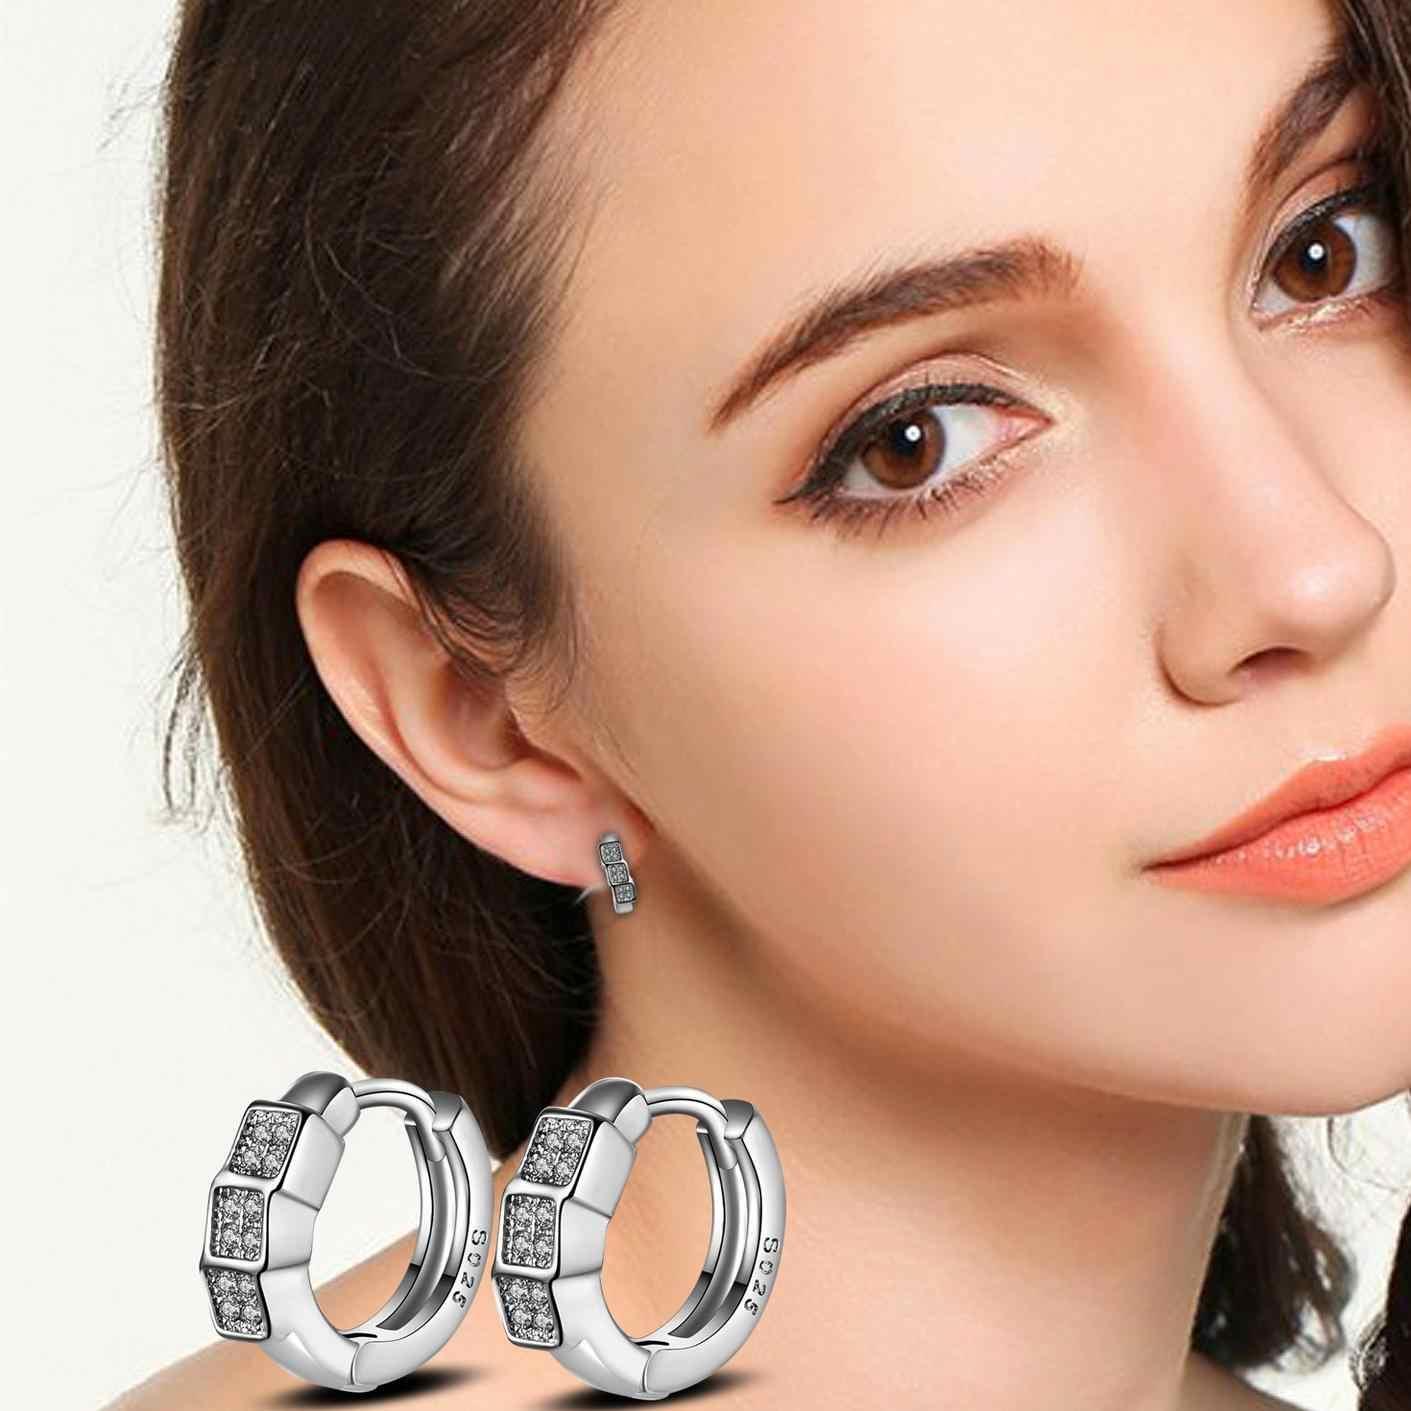 AAA זירקון עגילים לנשים עגילי עגיל 925 כסף סטרלינג תכשיטי חריש Brincos Brinco Oorbellen Pendientes F101